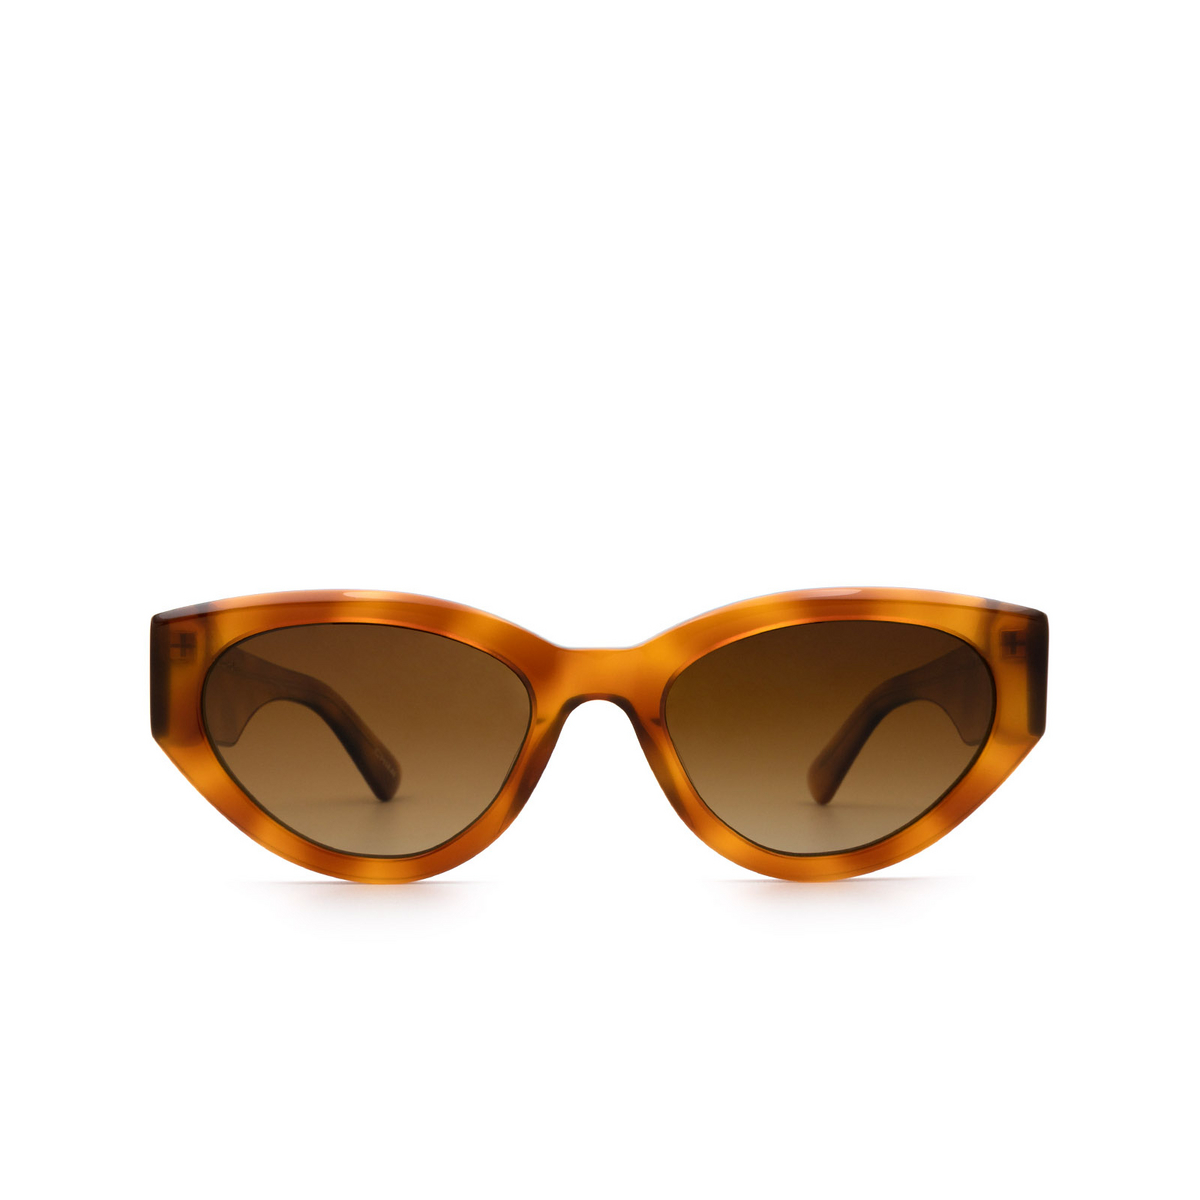 Chimi® Cat-eye Sunglasses: 06 color Havana - front view.